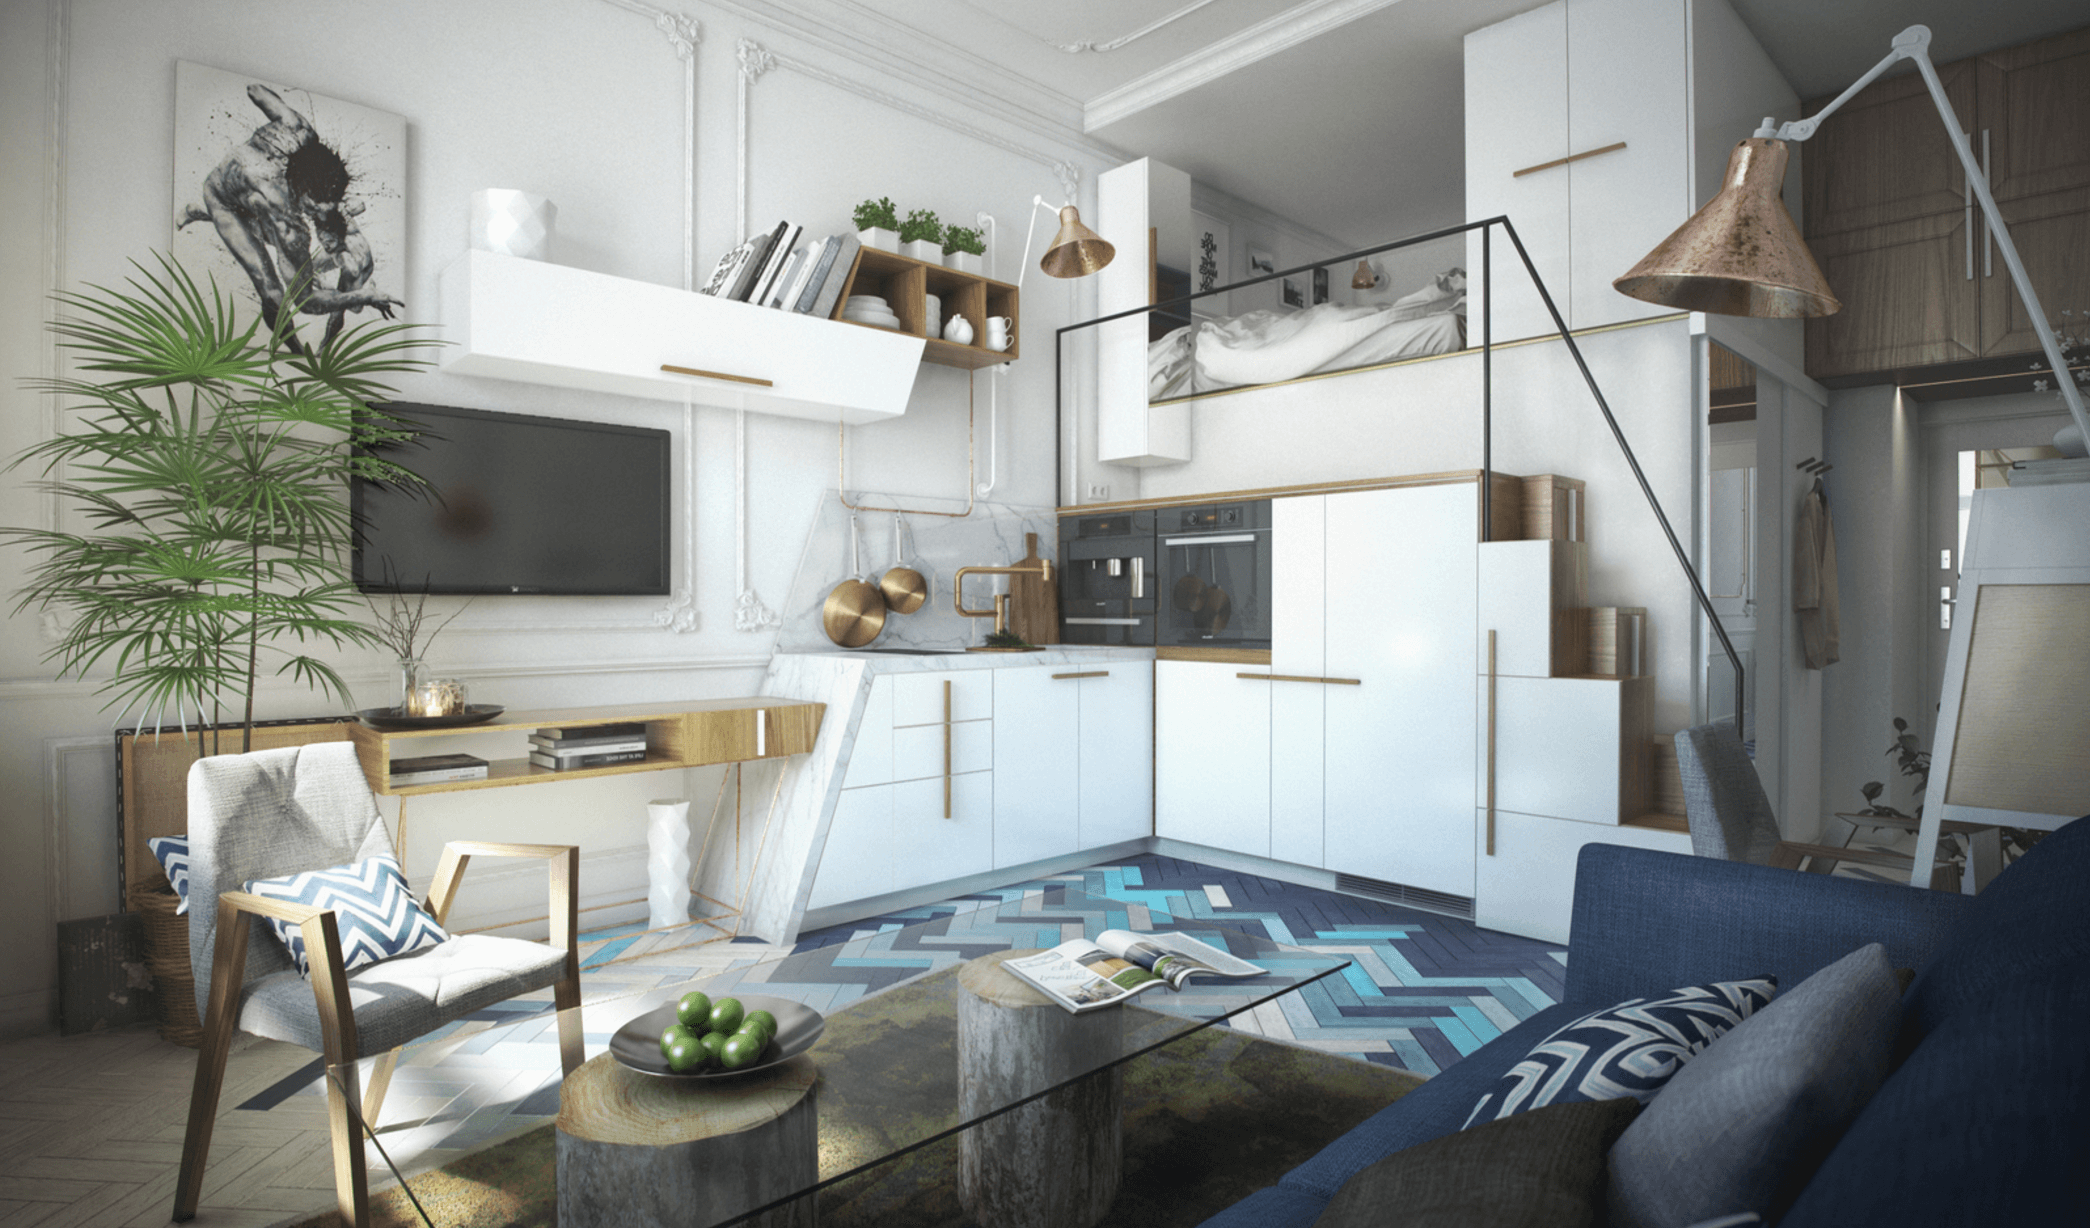 studio apartment design | Small living | Pinterest | Studio ...